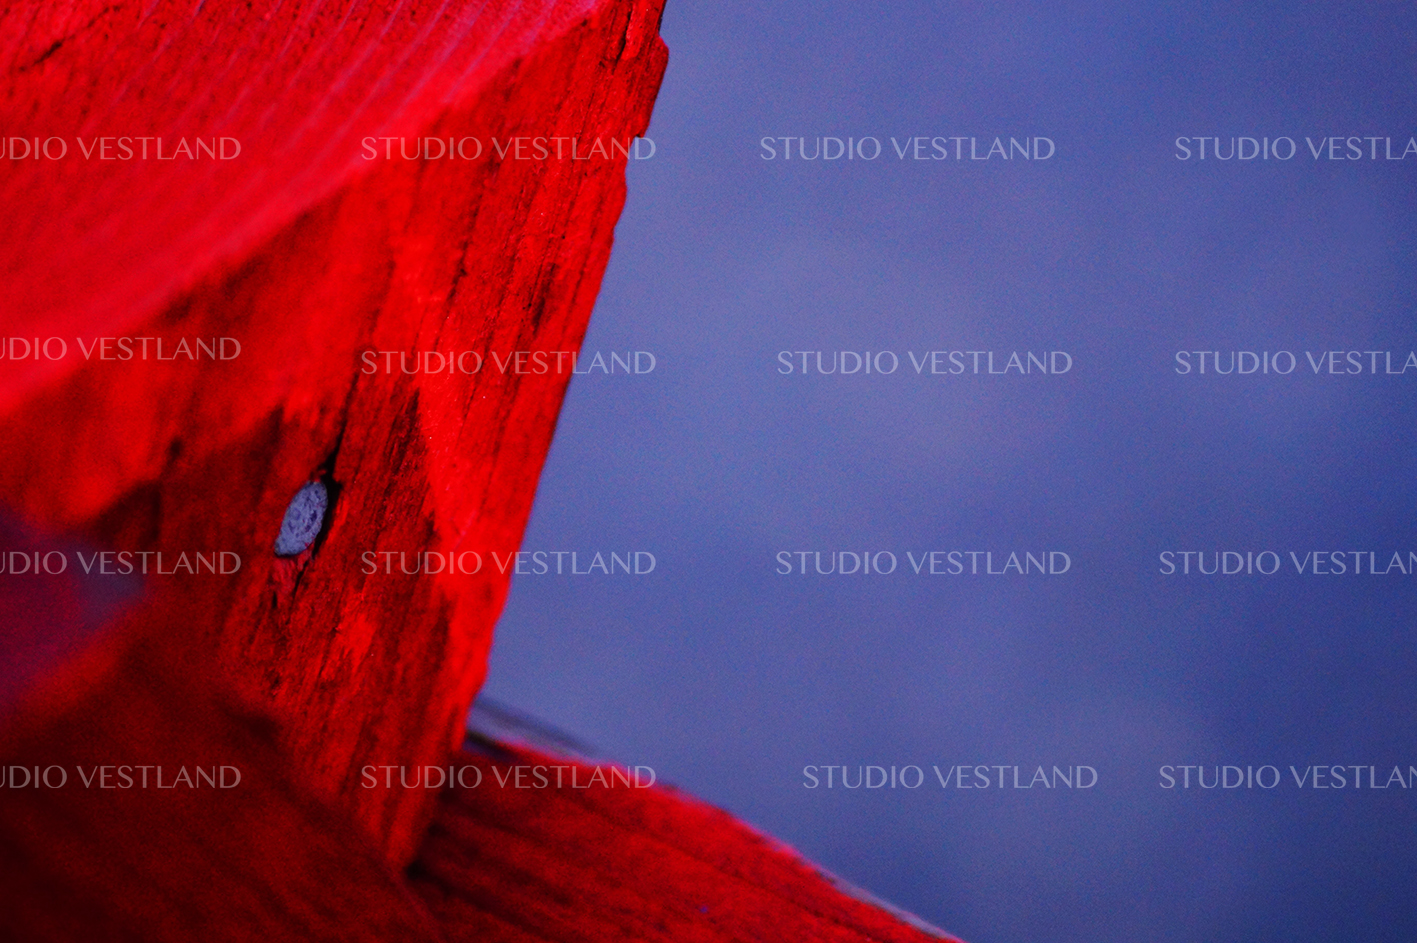 Studio Vestland - Sperre 02